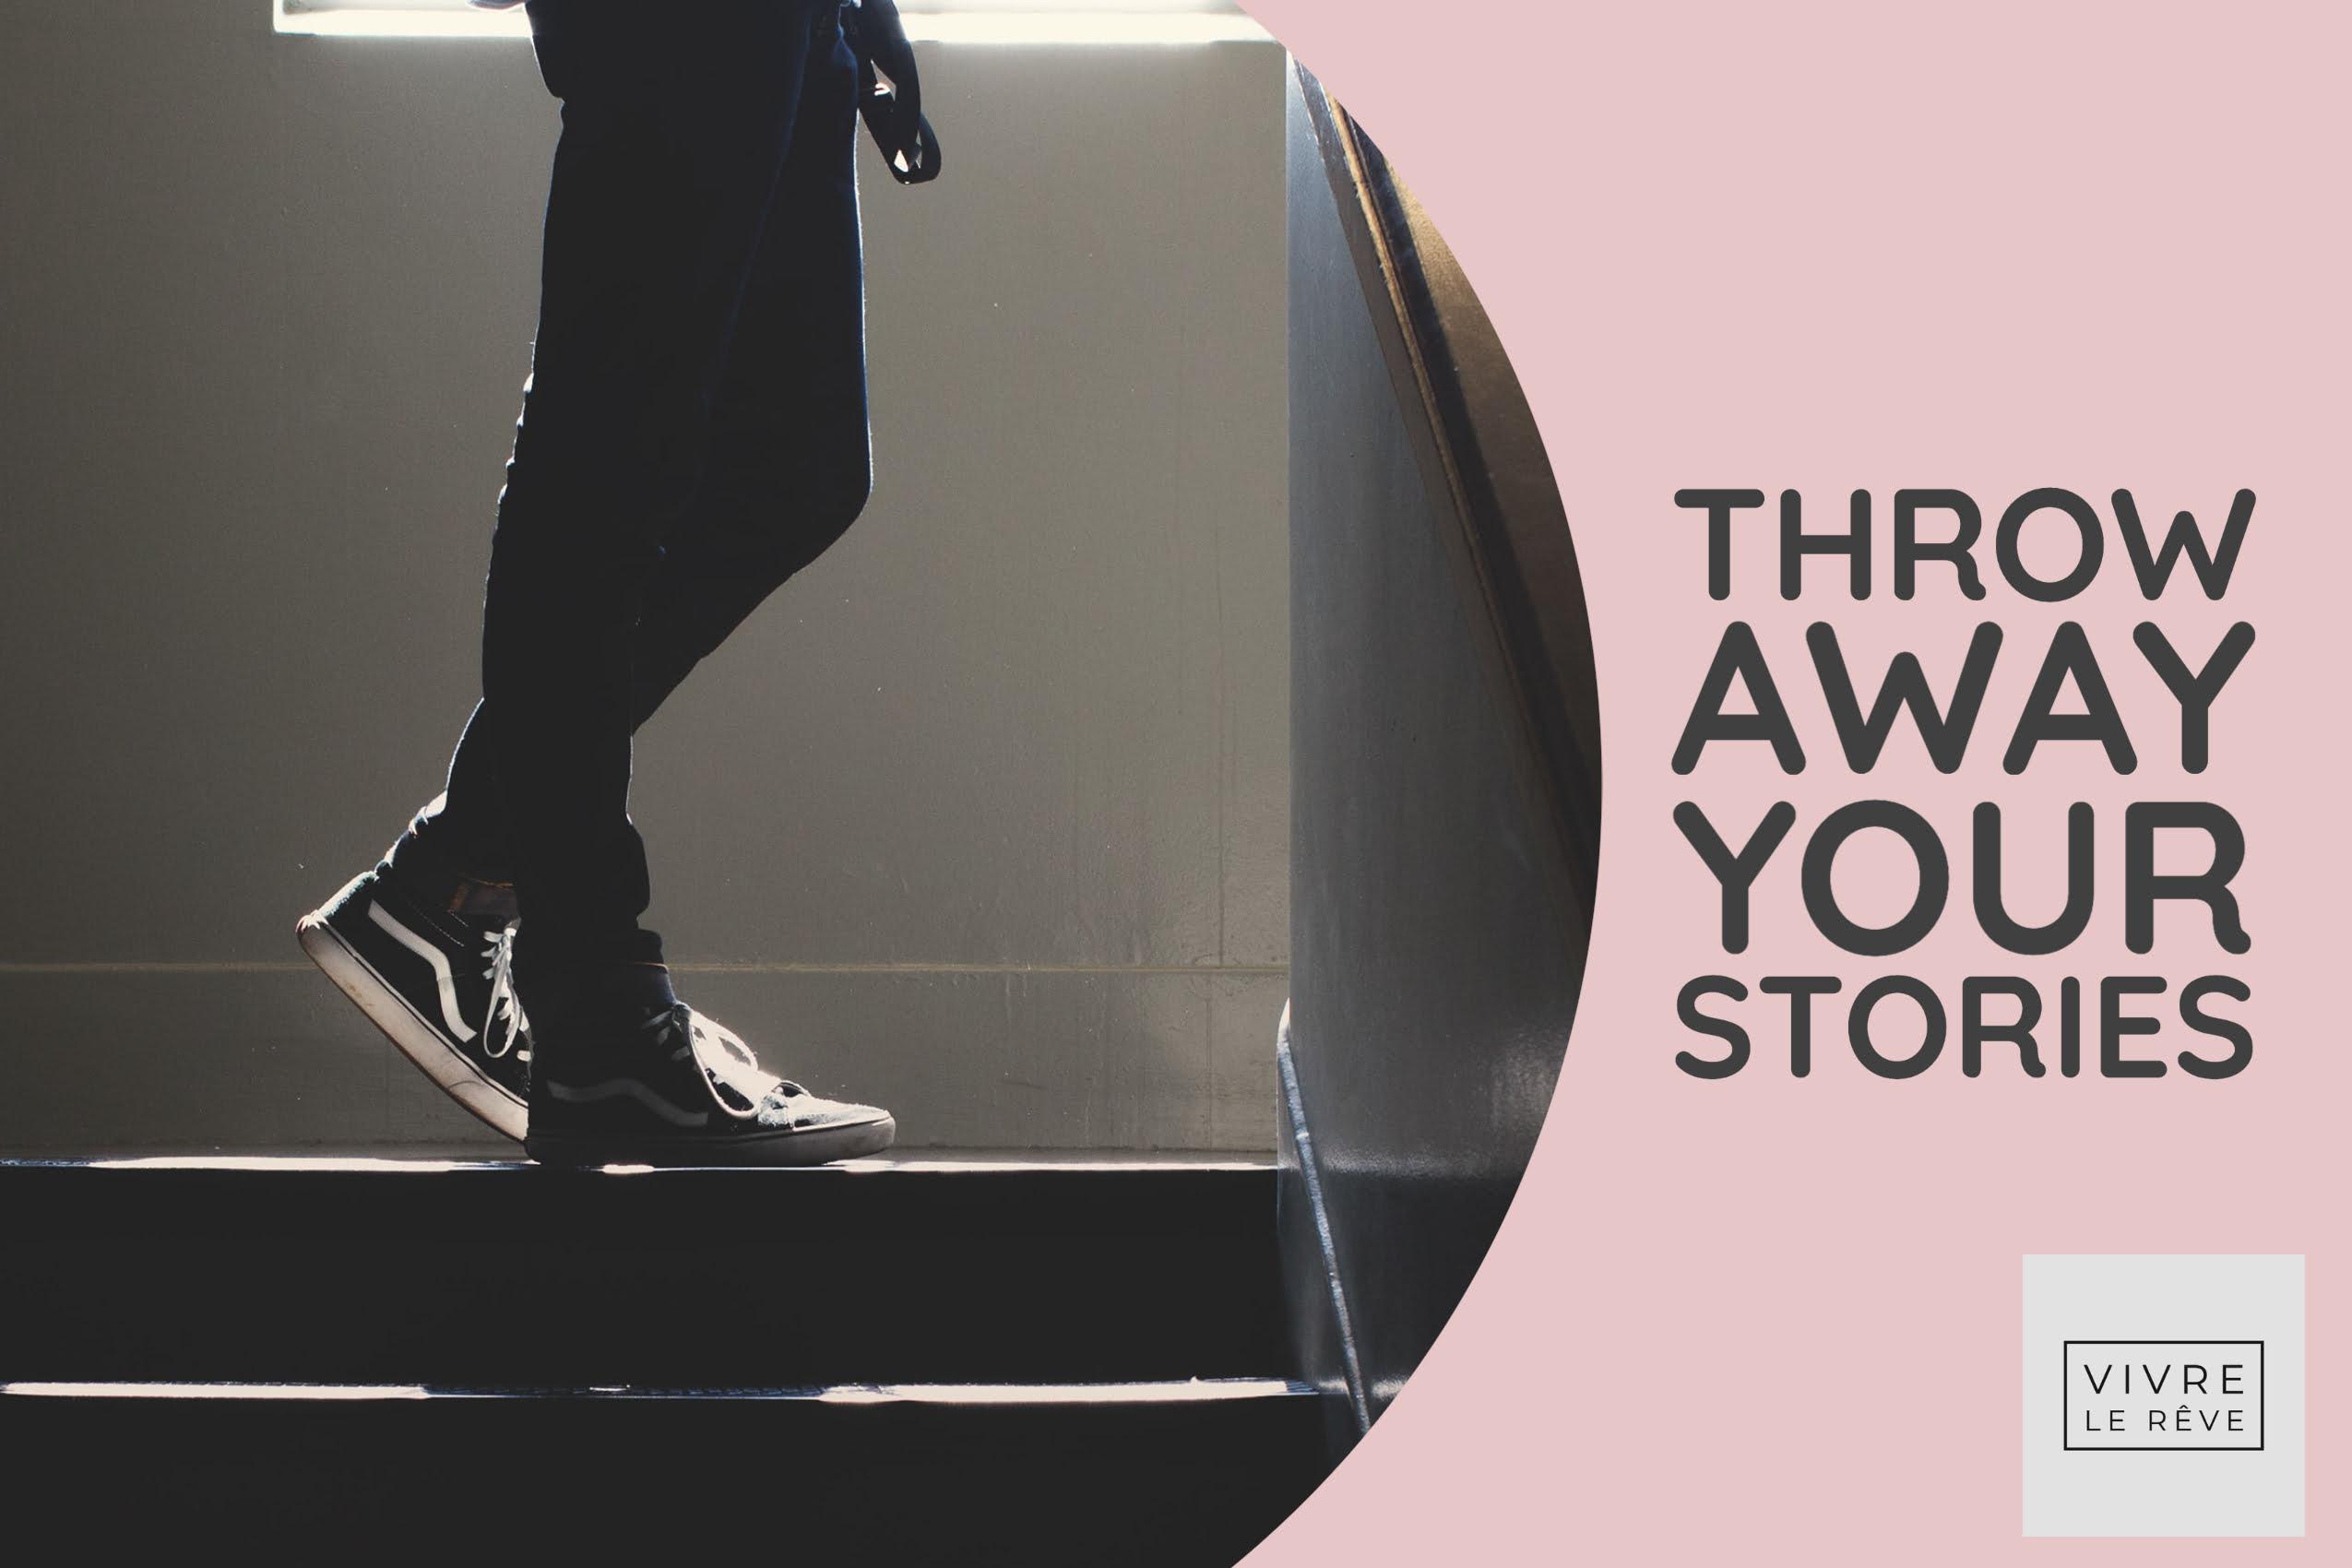 Throw Away Your Stories